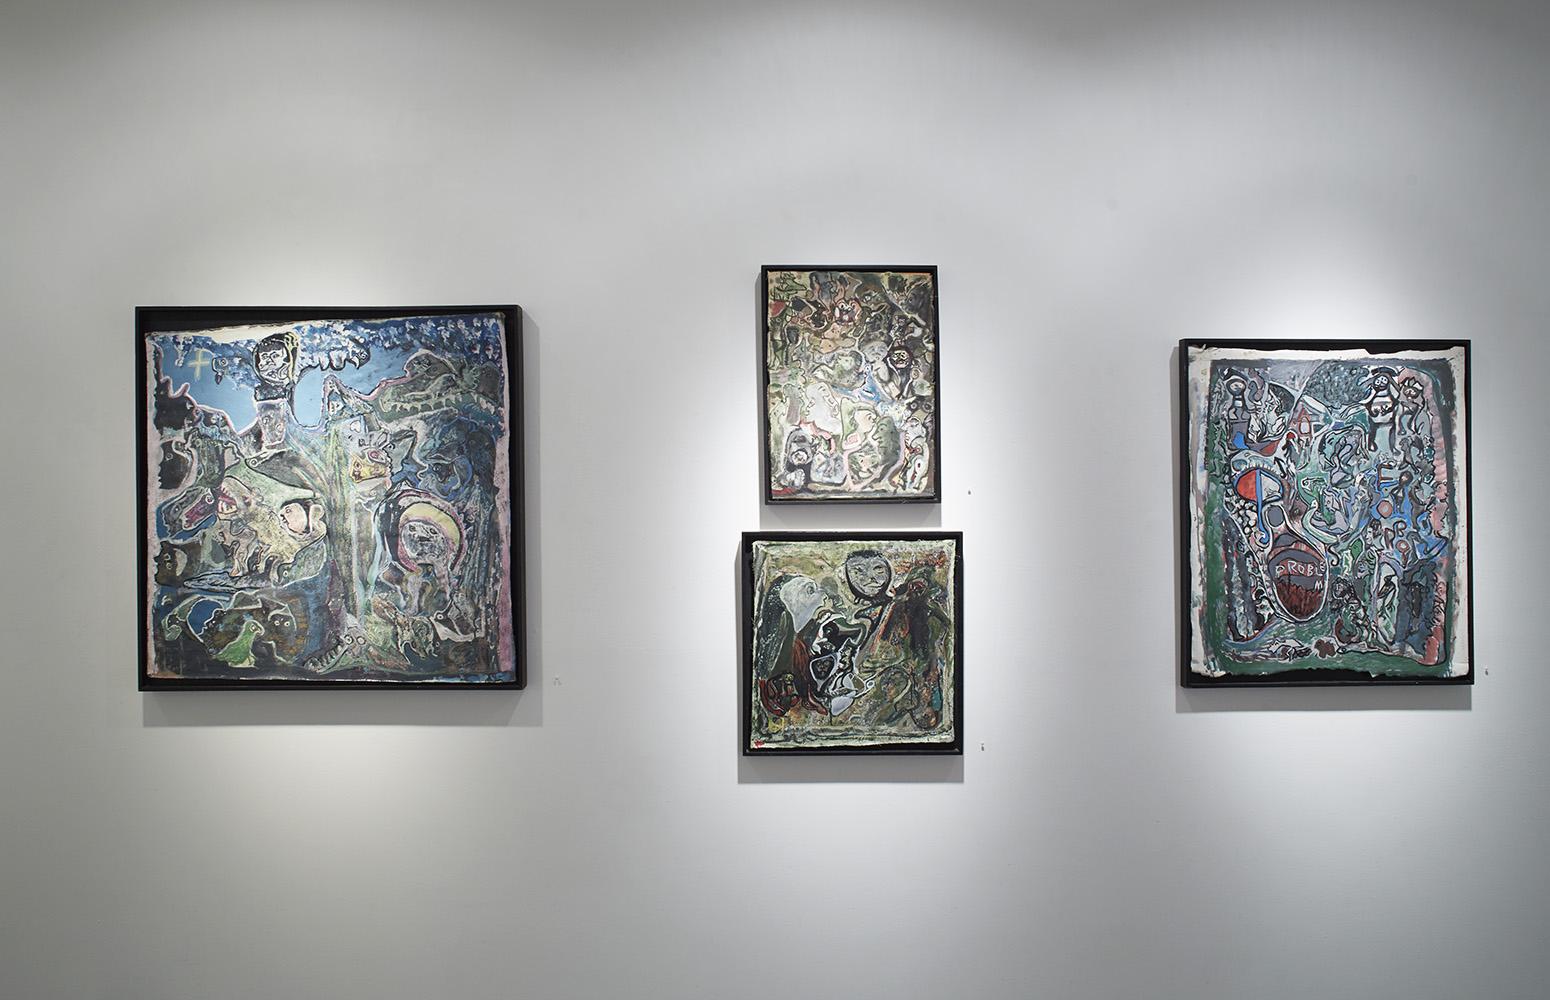 Tomáš Lampar,   Untitled  , 1999,,Watercolor on paper,11.81 x 16.54 inches,30 x 42 cm,TLa 24